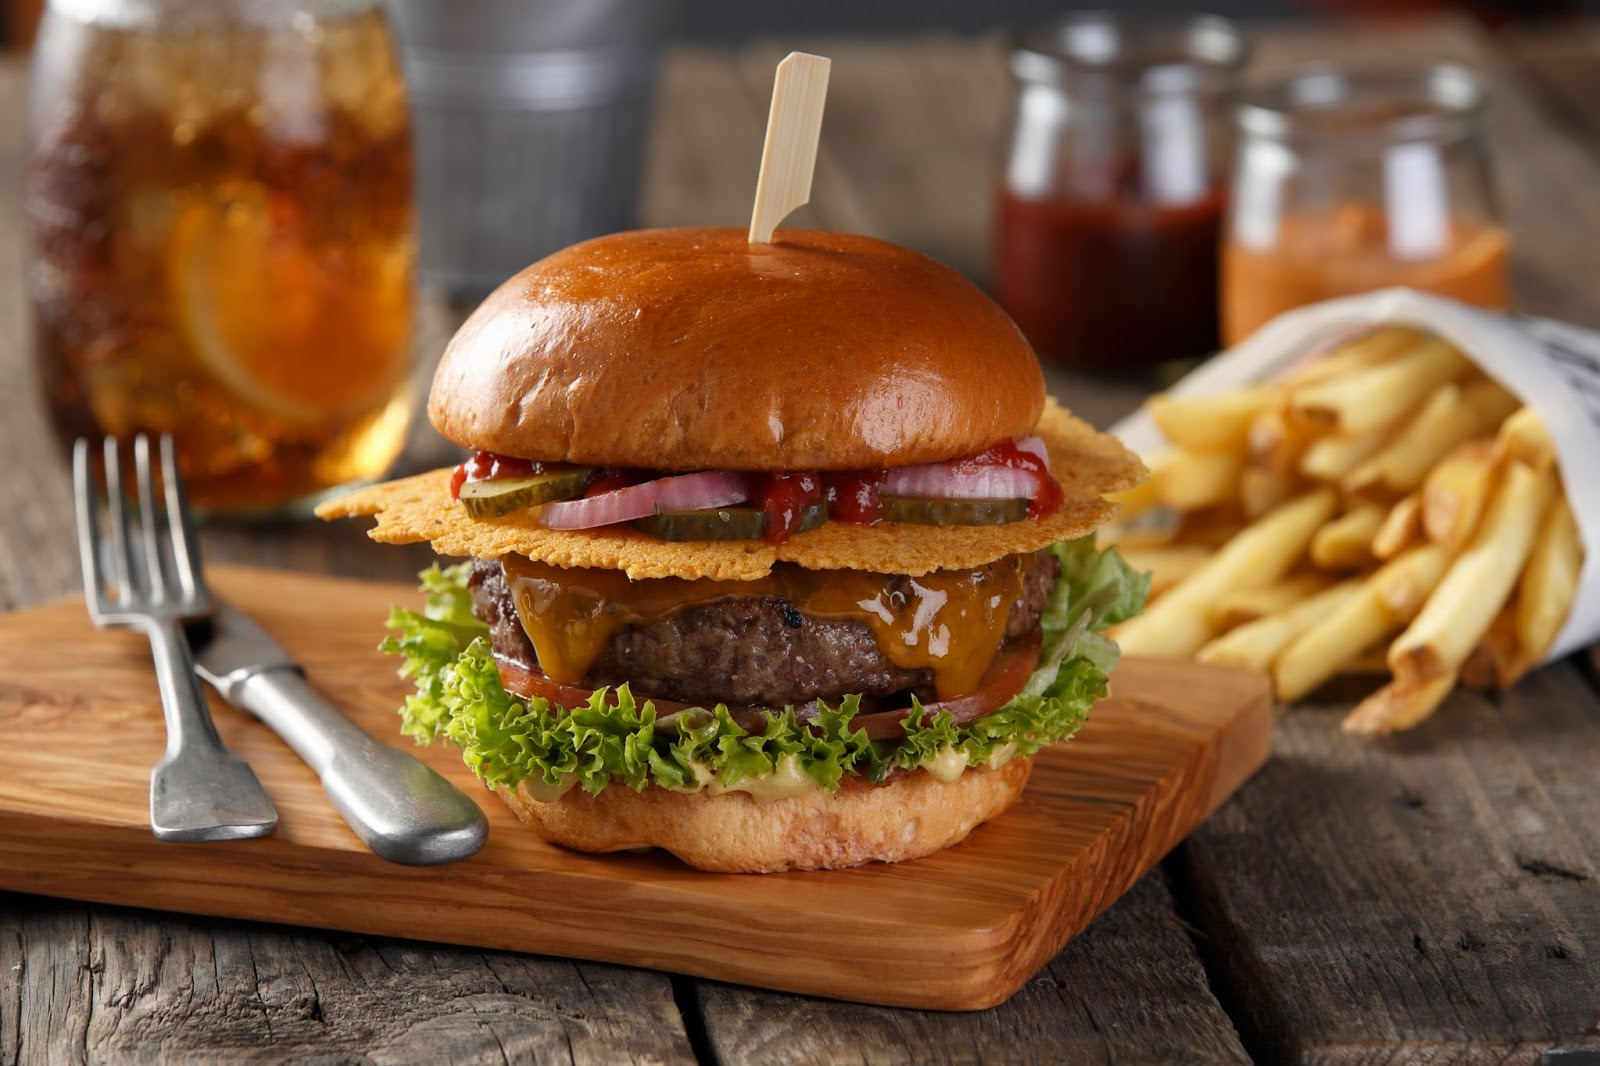 Blaze Burgers - Redefining The Premium Fast Casual Burgers Segment